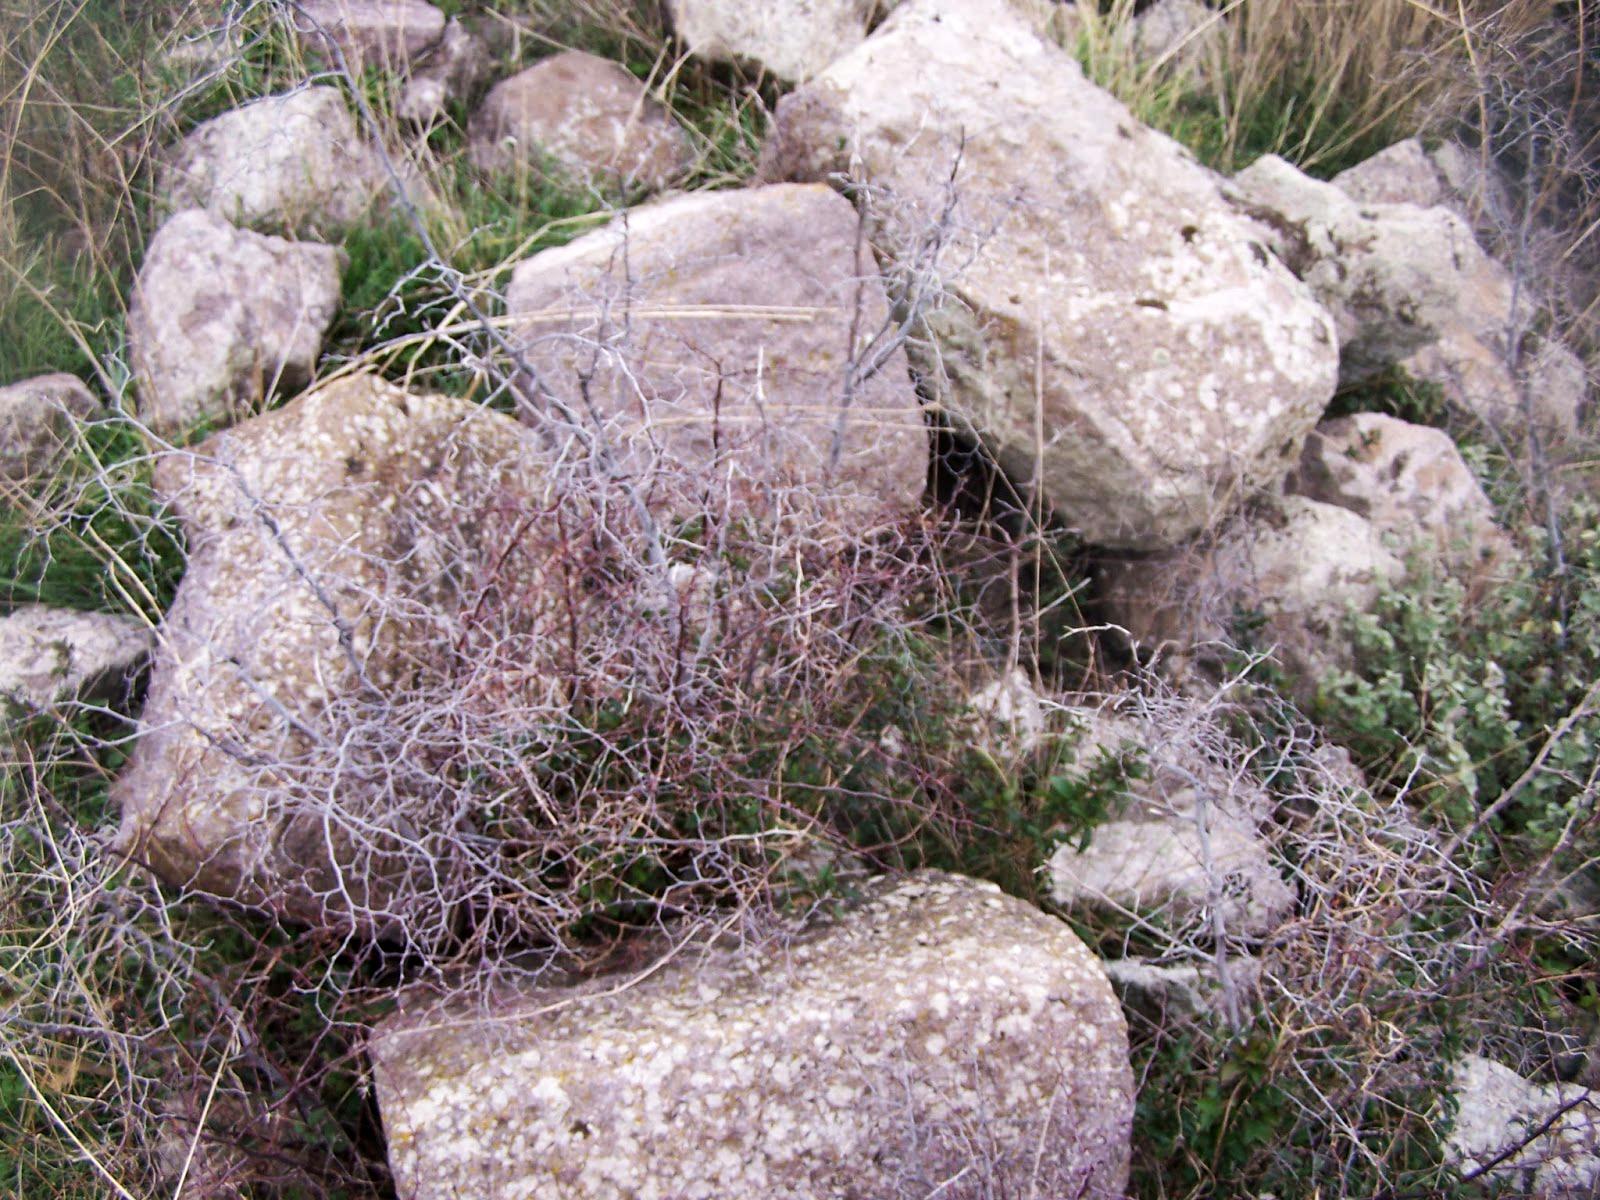 akropol-004-andezit-yapi-taslari-ibrahim-fidanoglu